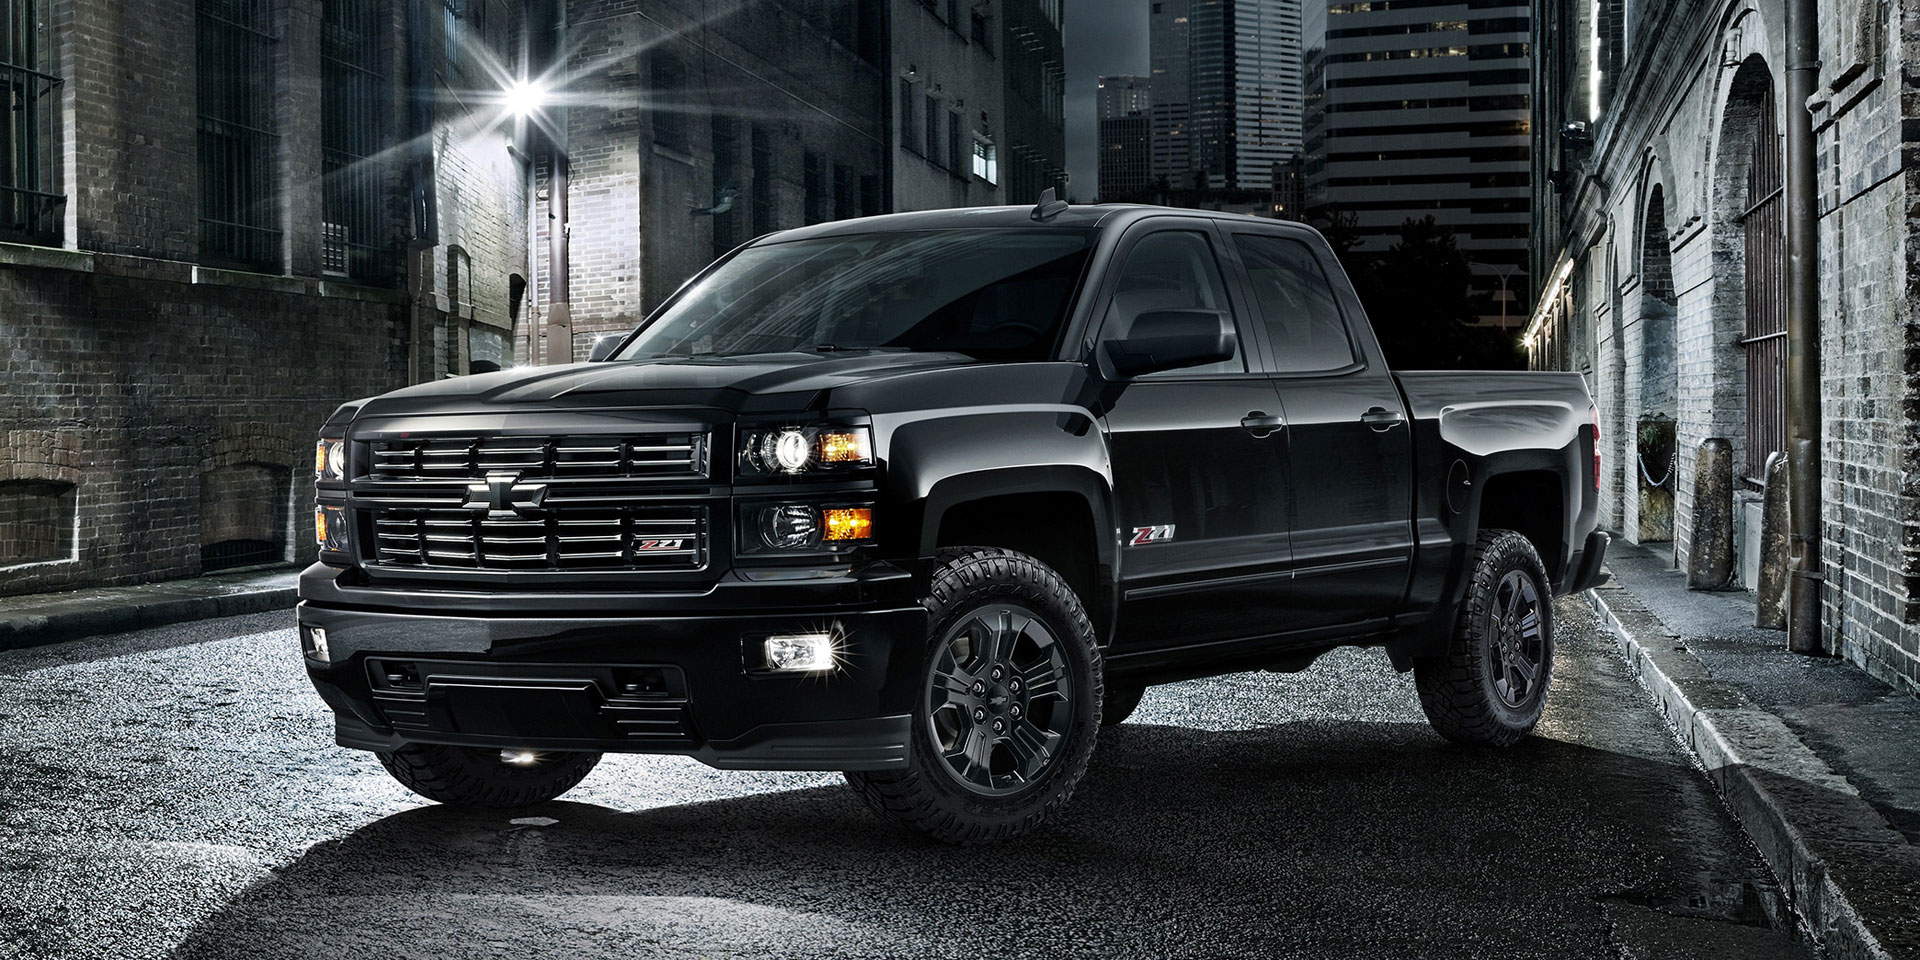 2015-Chevrolet-Silverado-Midnight-Edition-1